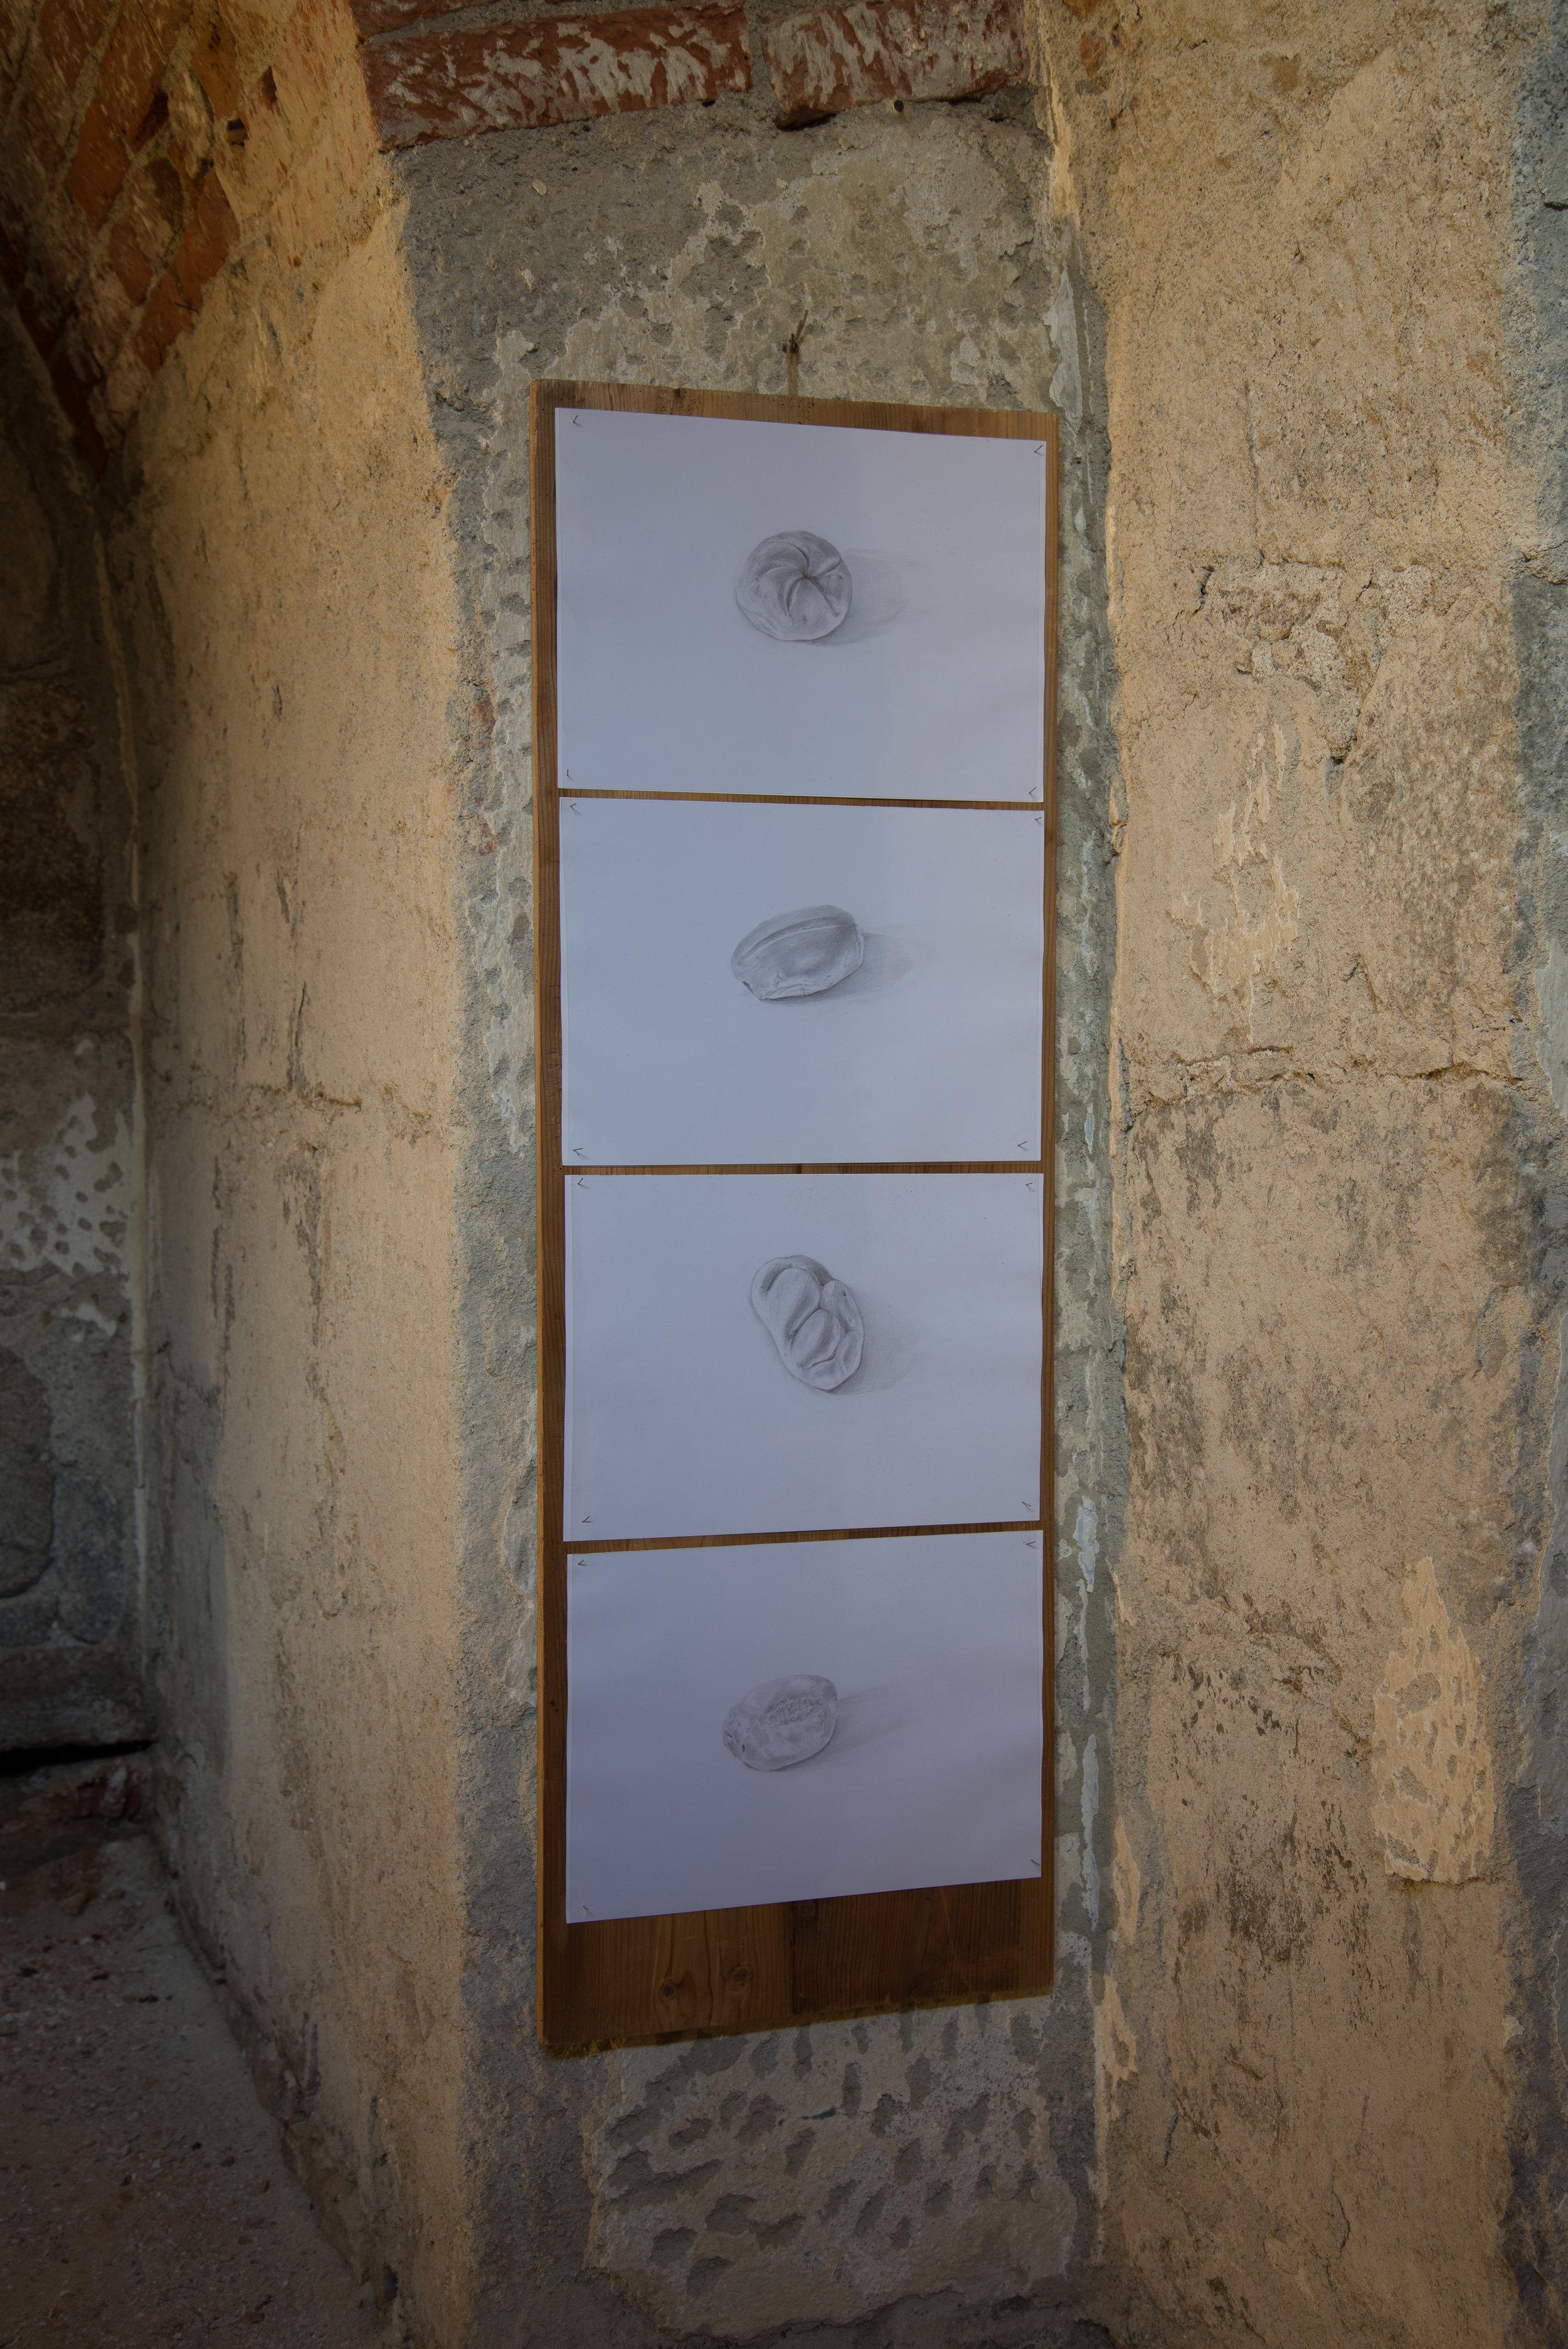 BREAD 2013  4 drawings 42x30cm